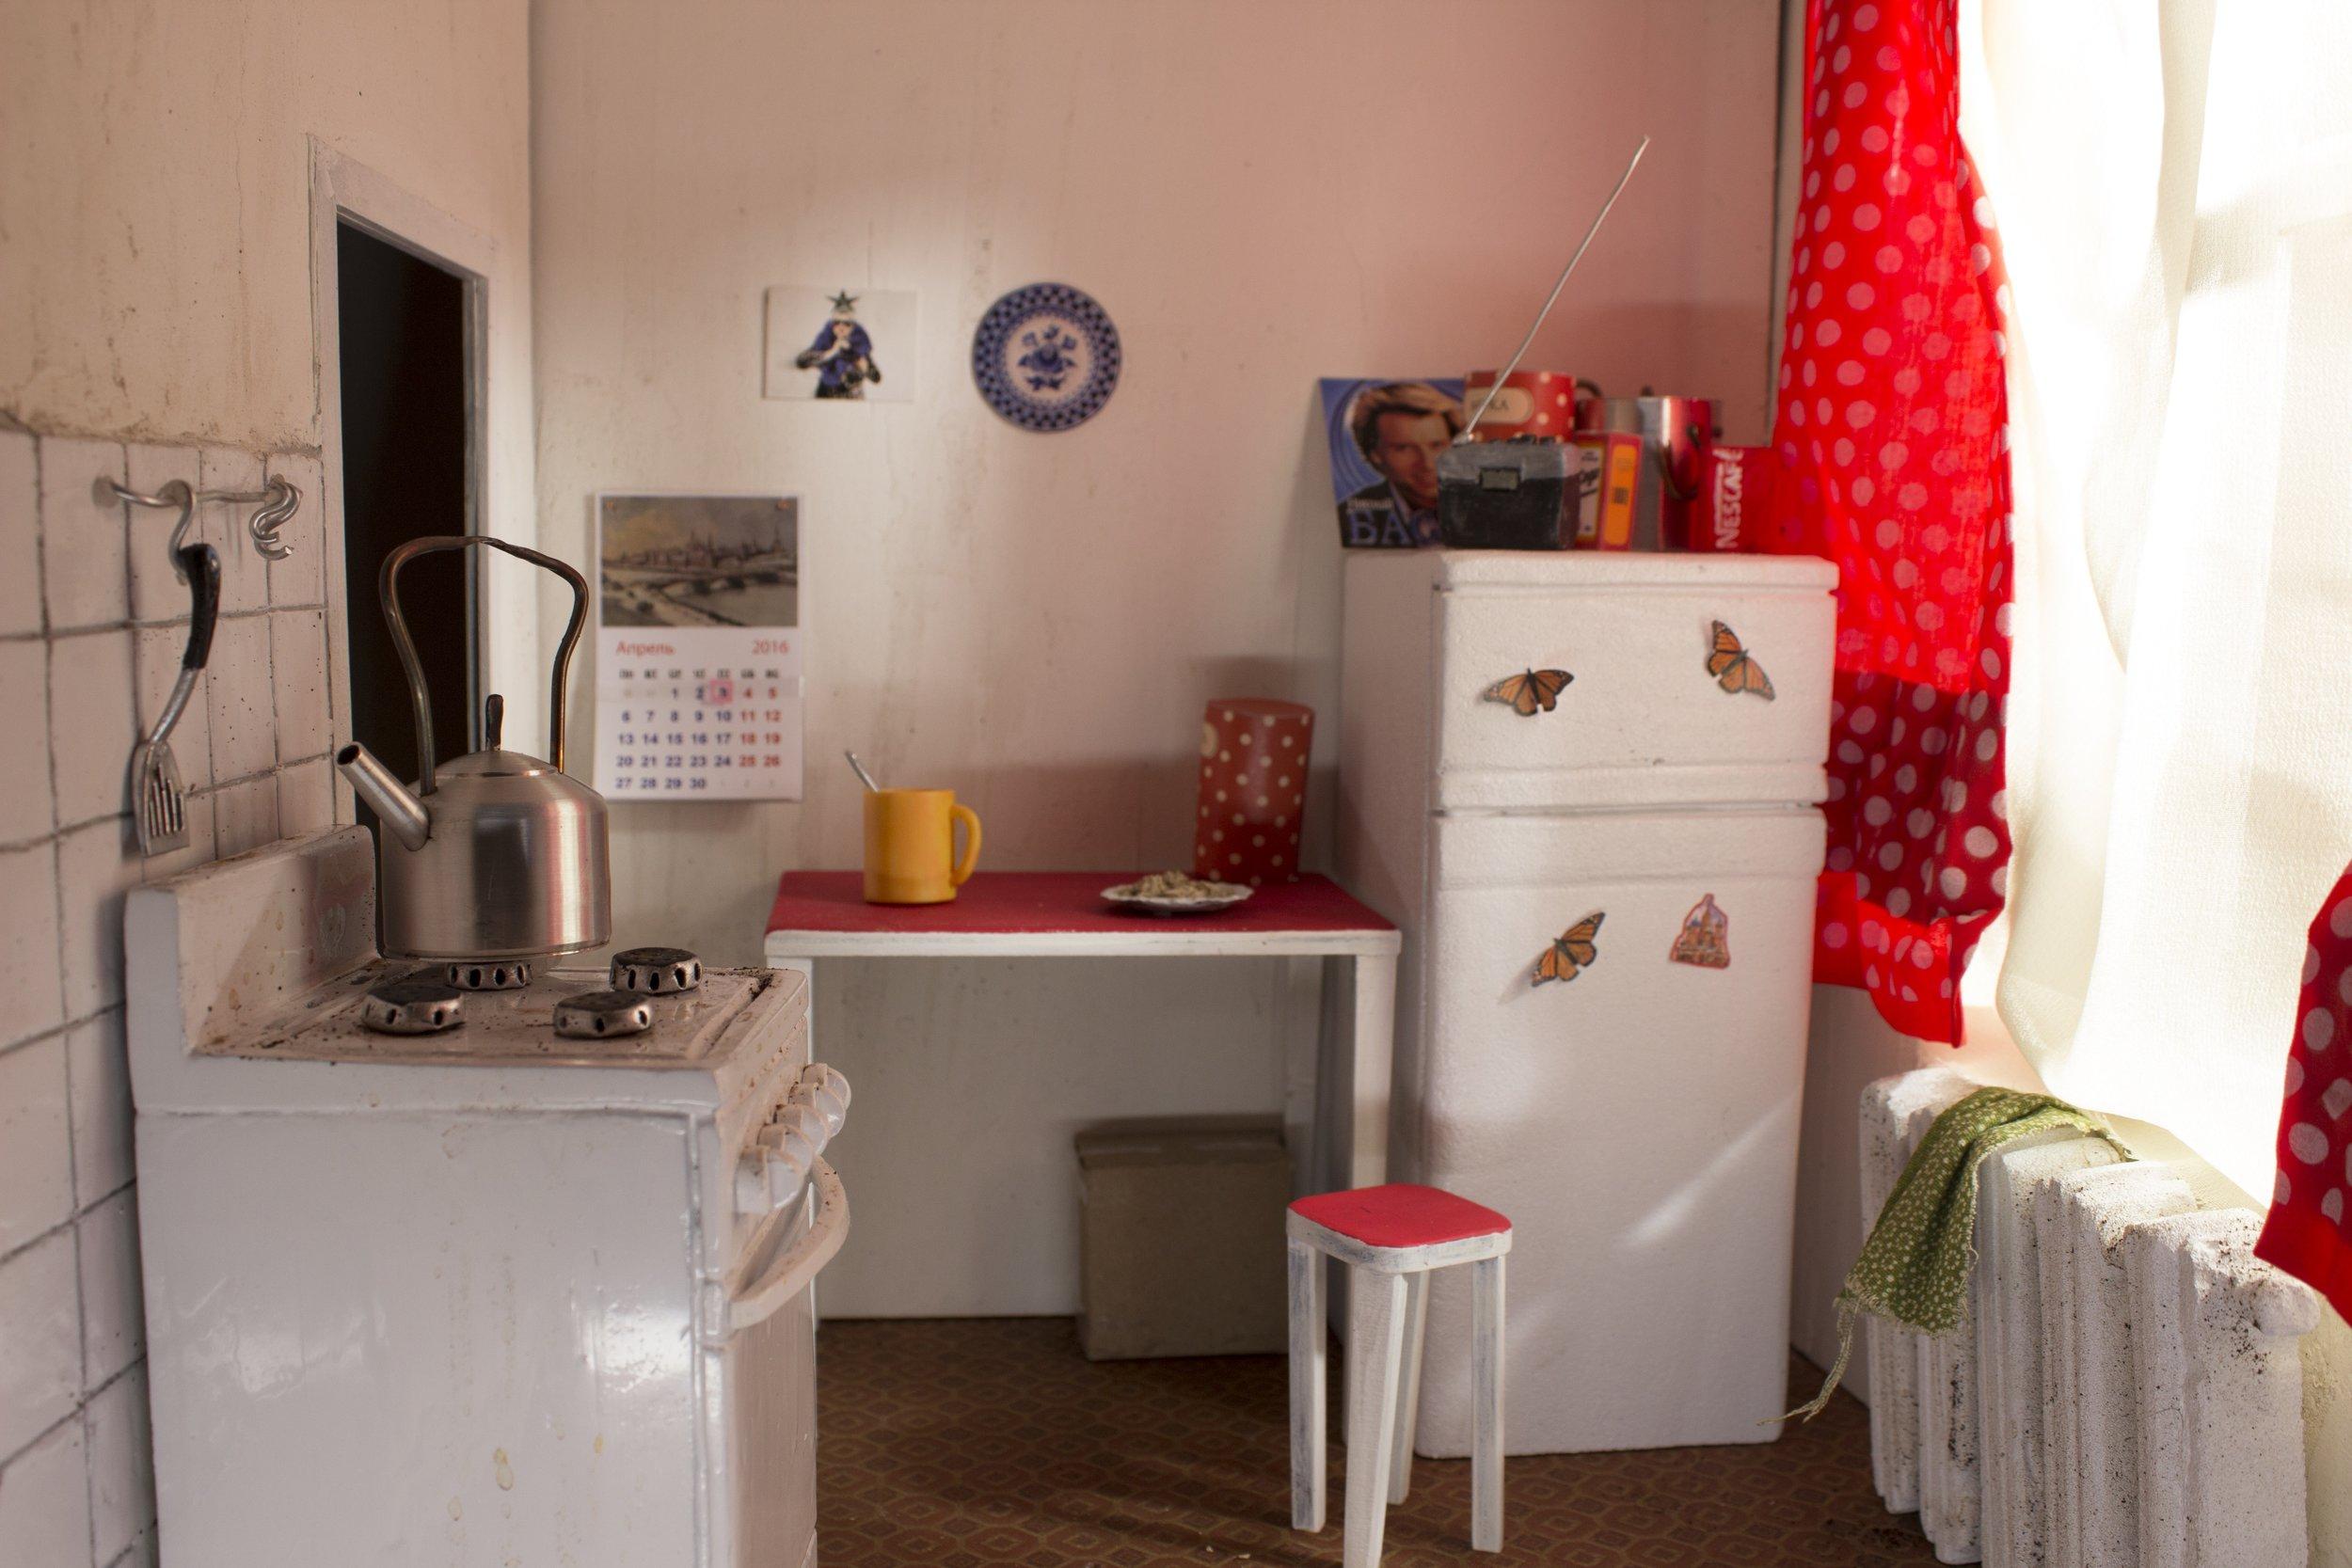 Kitchen Set (Oh, My Domovoi)